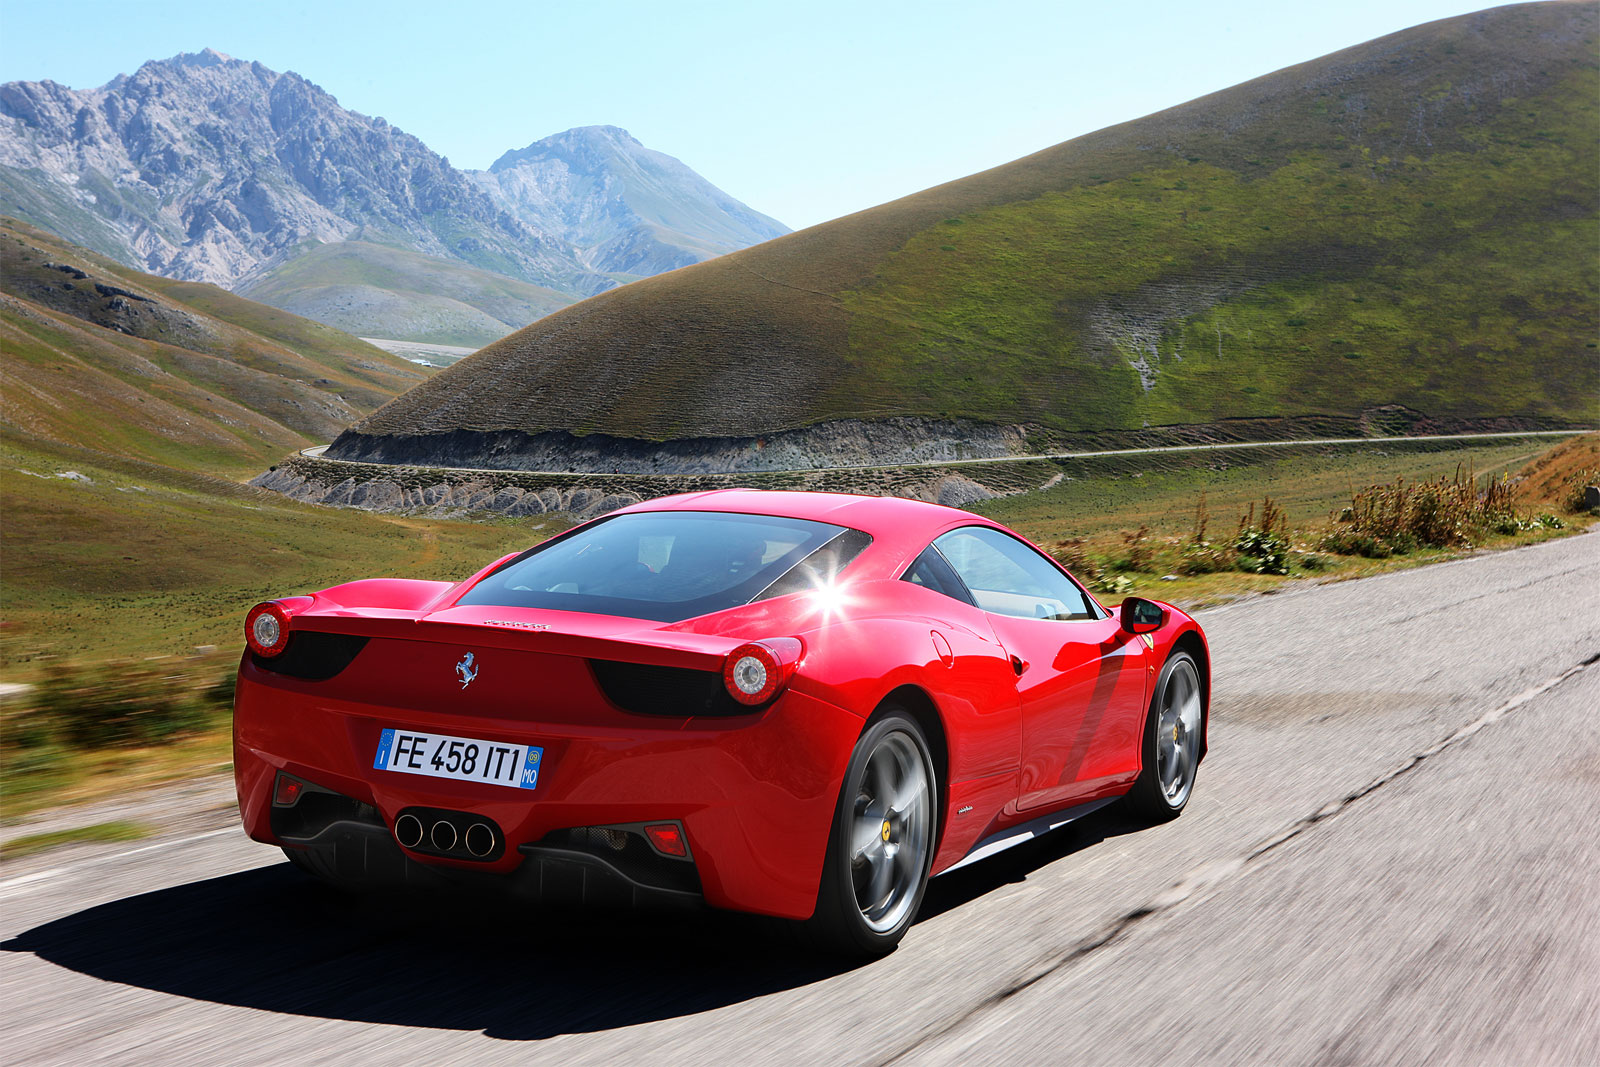 http://4.bp.blogspot.com/-hb8803NbOA8/T-CKyU1lTEI/AAAAAAAADfs/1cYdDHd2804/s1600/Ferrari+458+Italia+hd+Wallpapers+2011_7.jpg